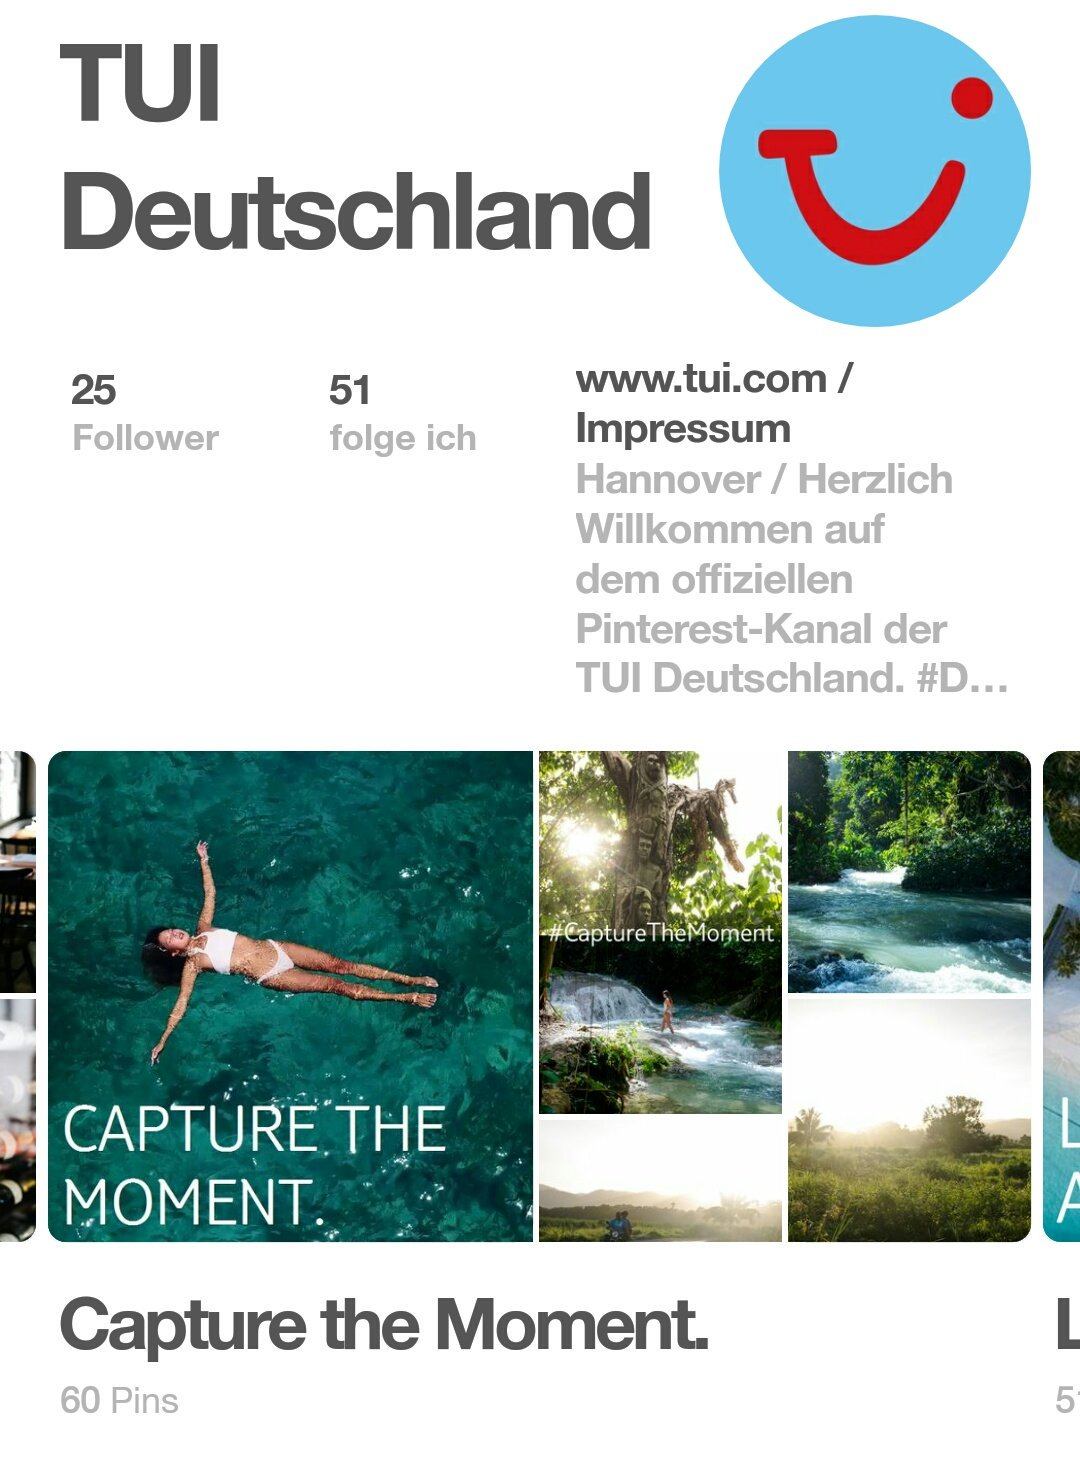 TUI Deutschland on Twitter